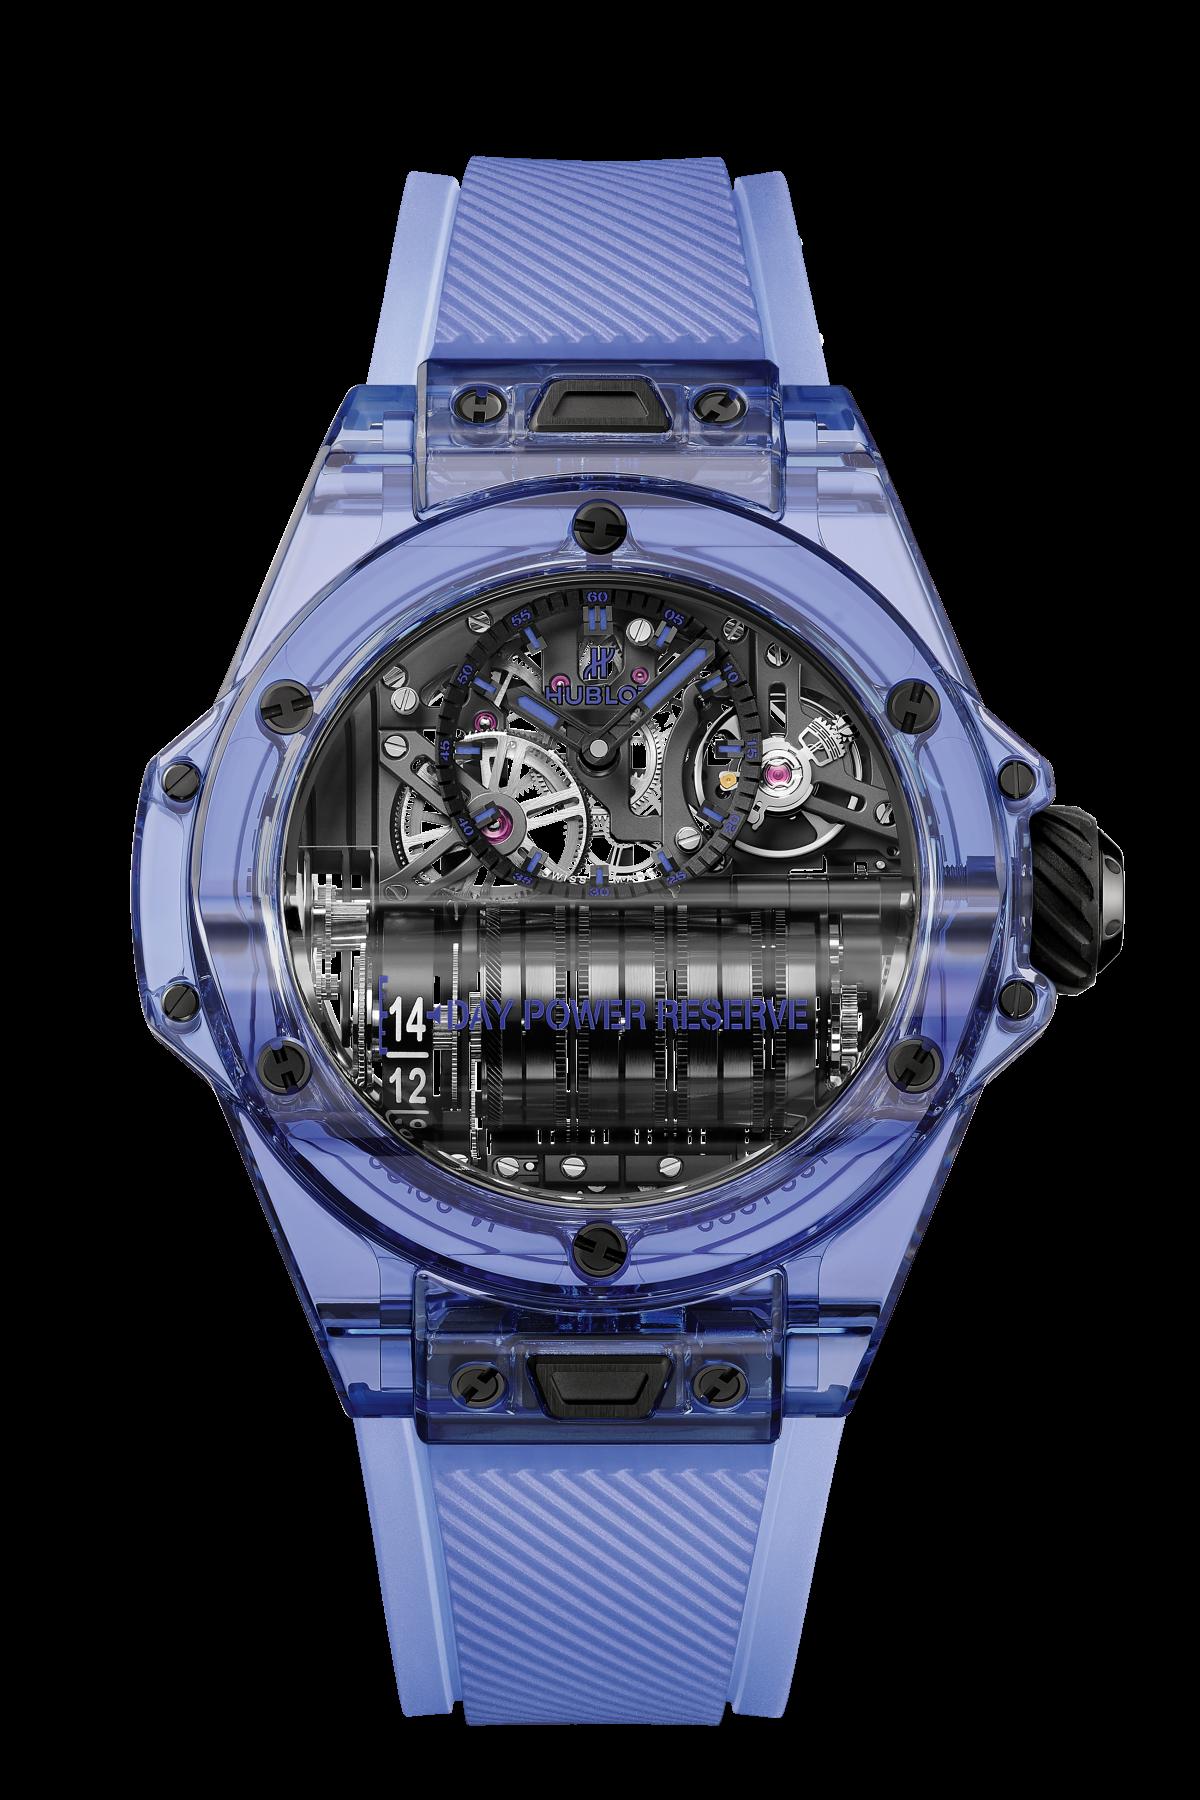 BIG BANG MP-11 POWER RESERVE 14 DAYS BLUE SAPPHIRE